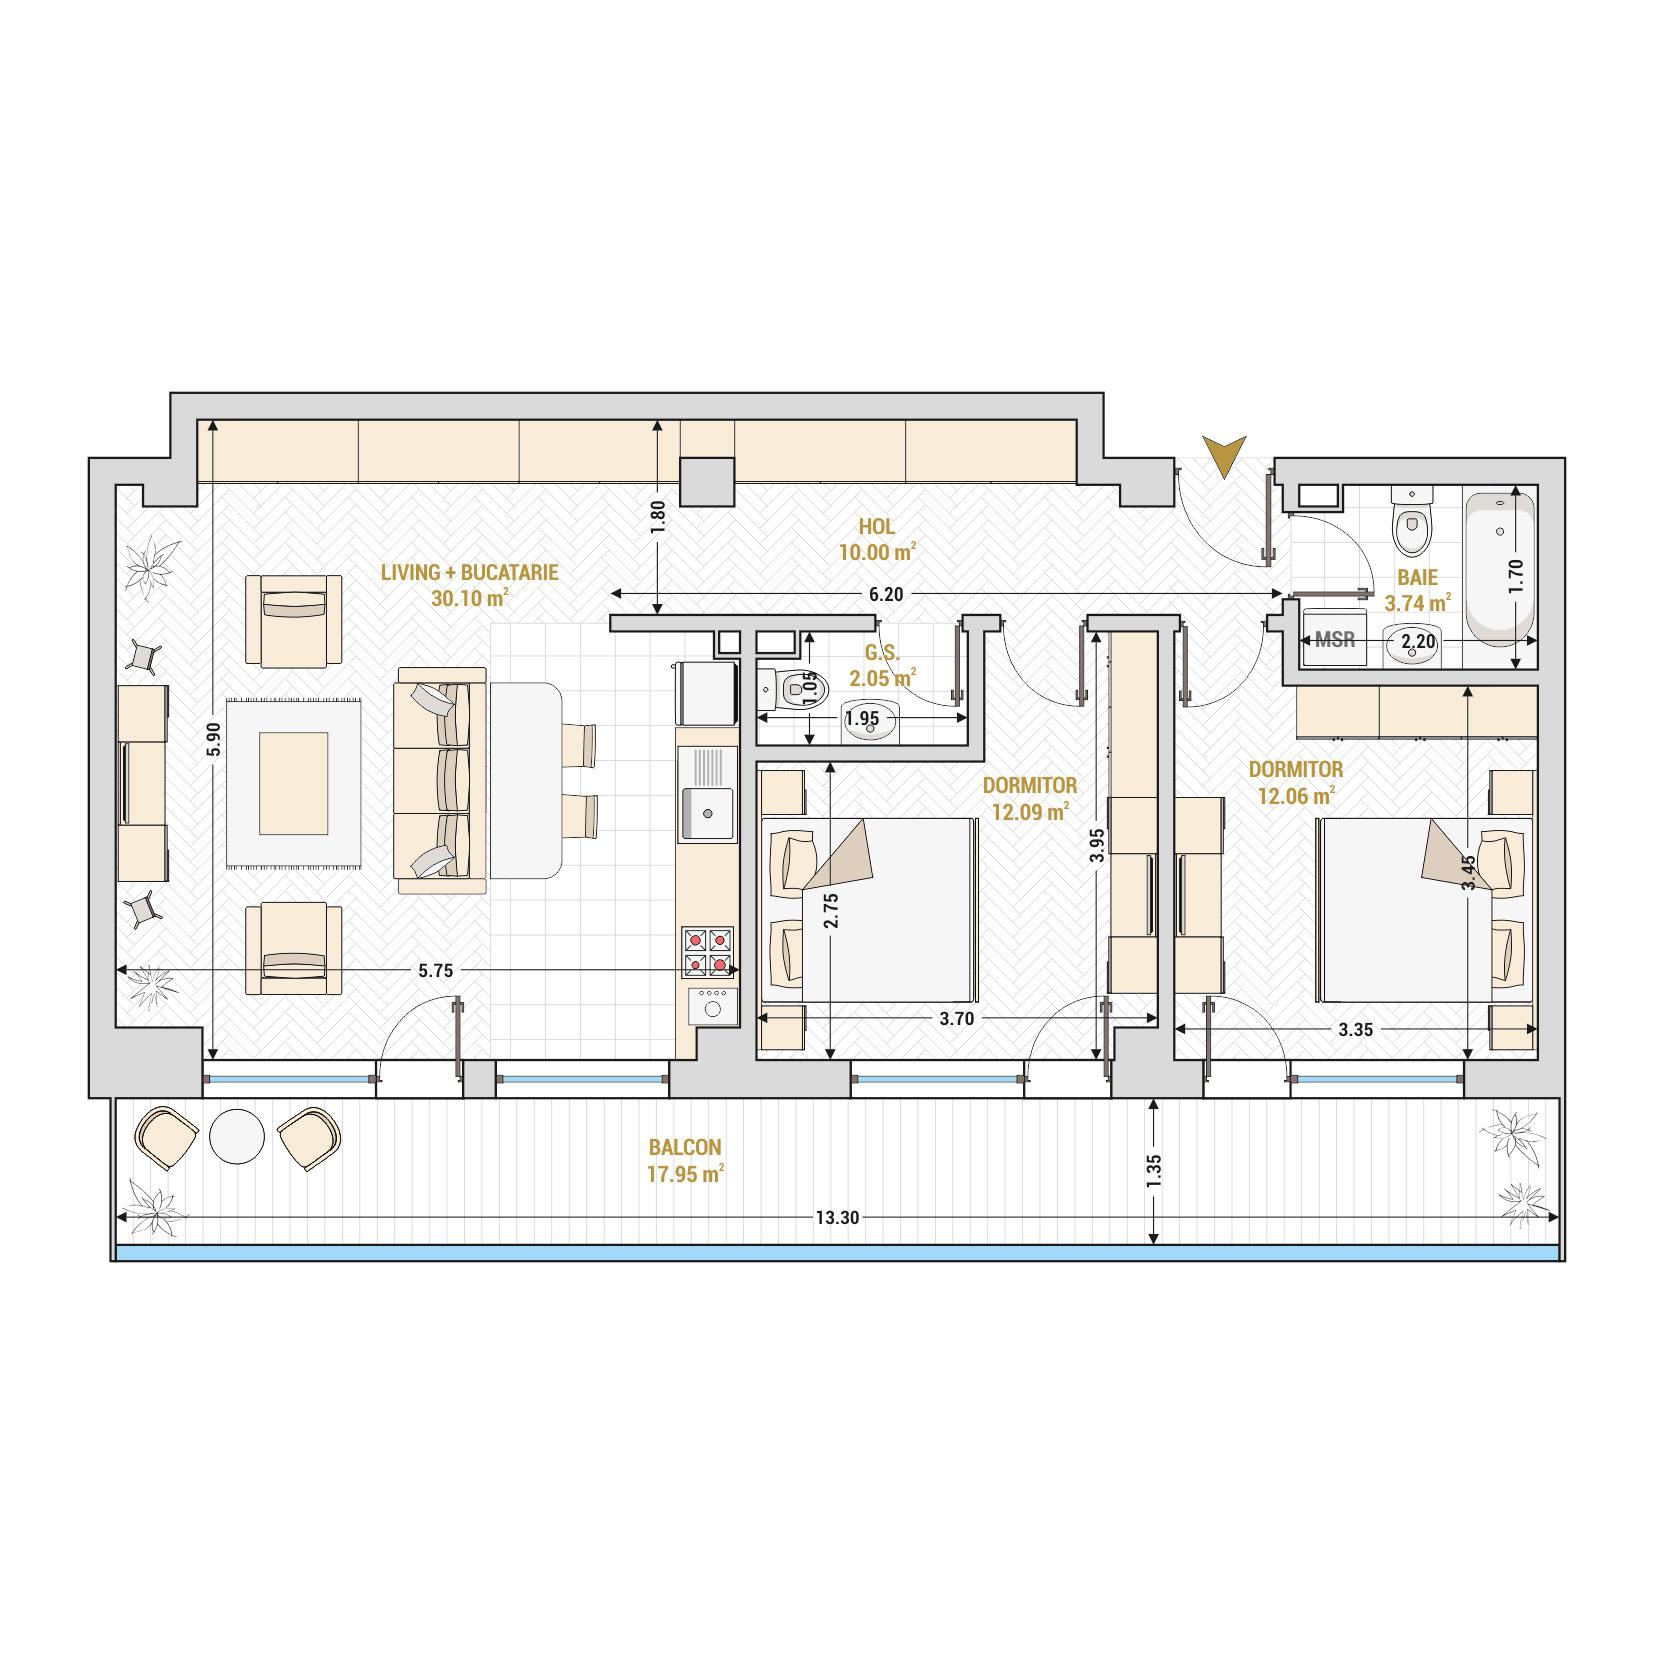 Apartament 3 camere de vanzare Bucuresti - Catedral Residence - Marriott, Piata Unirii, 13 Septembrie, Izvor - Tip 5 - T2 - Open Space